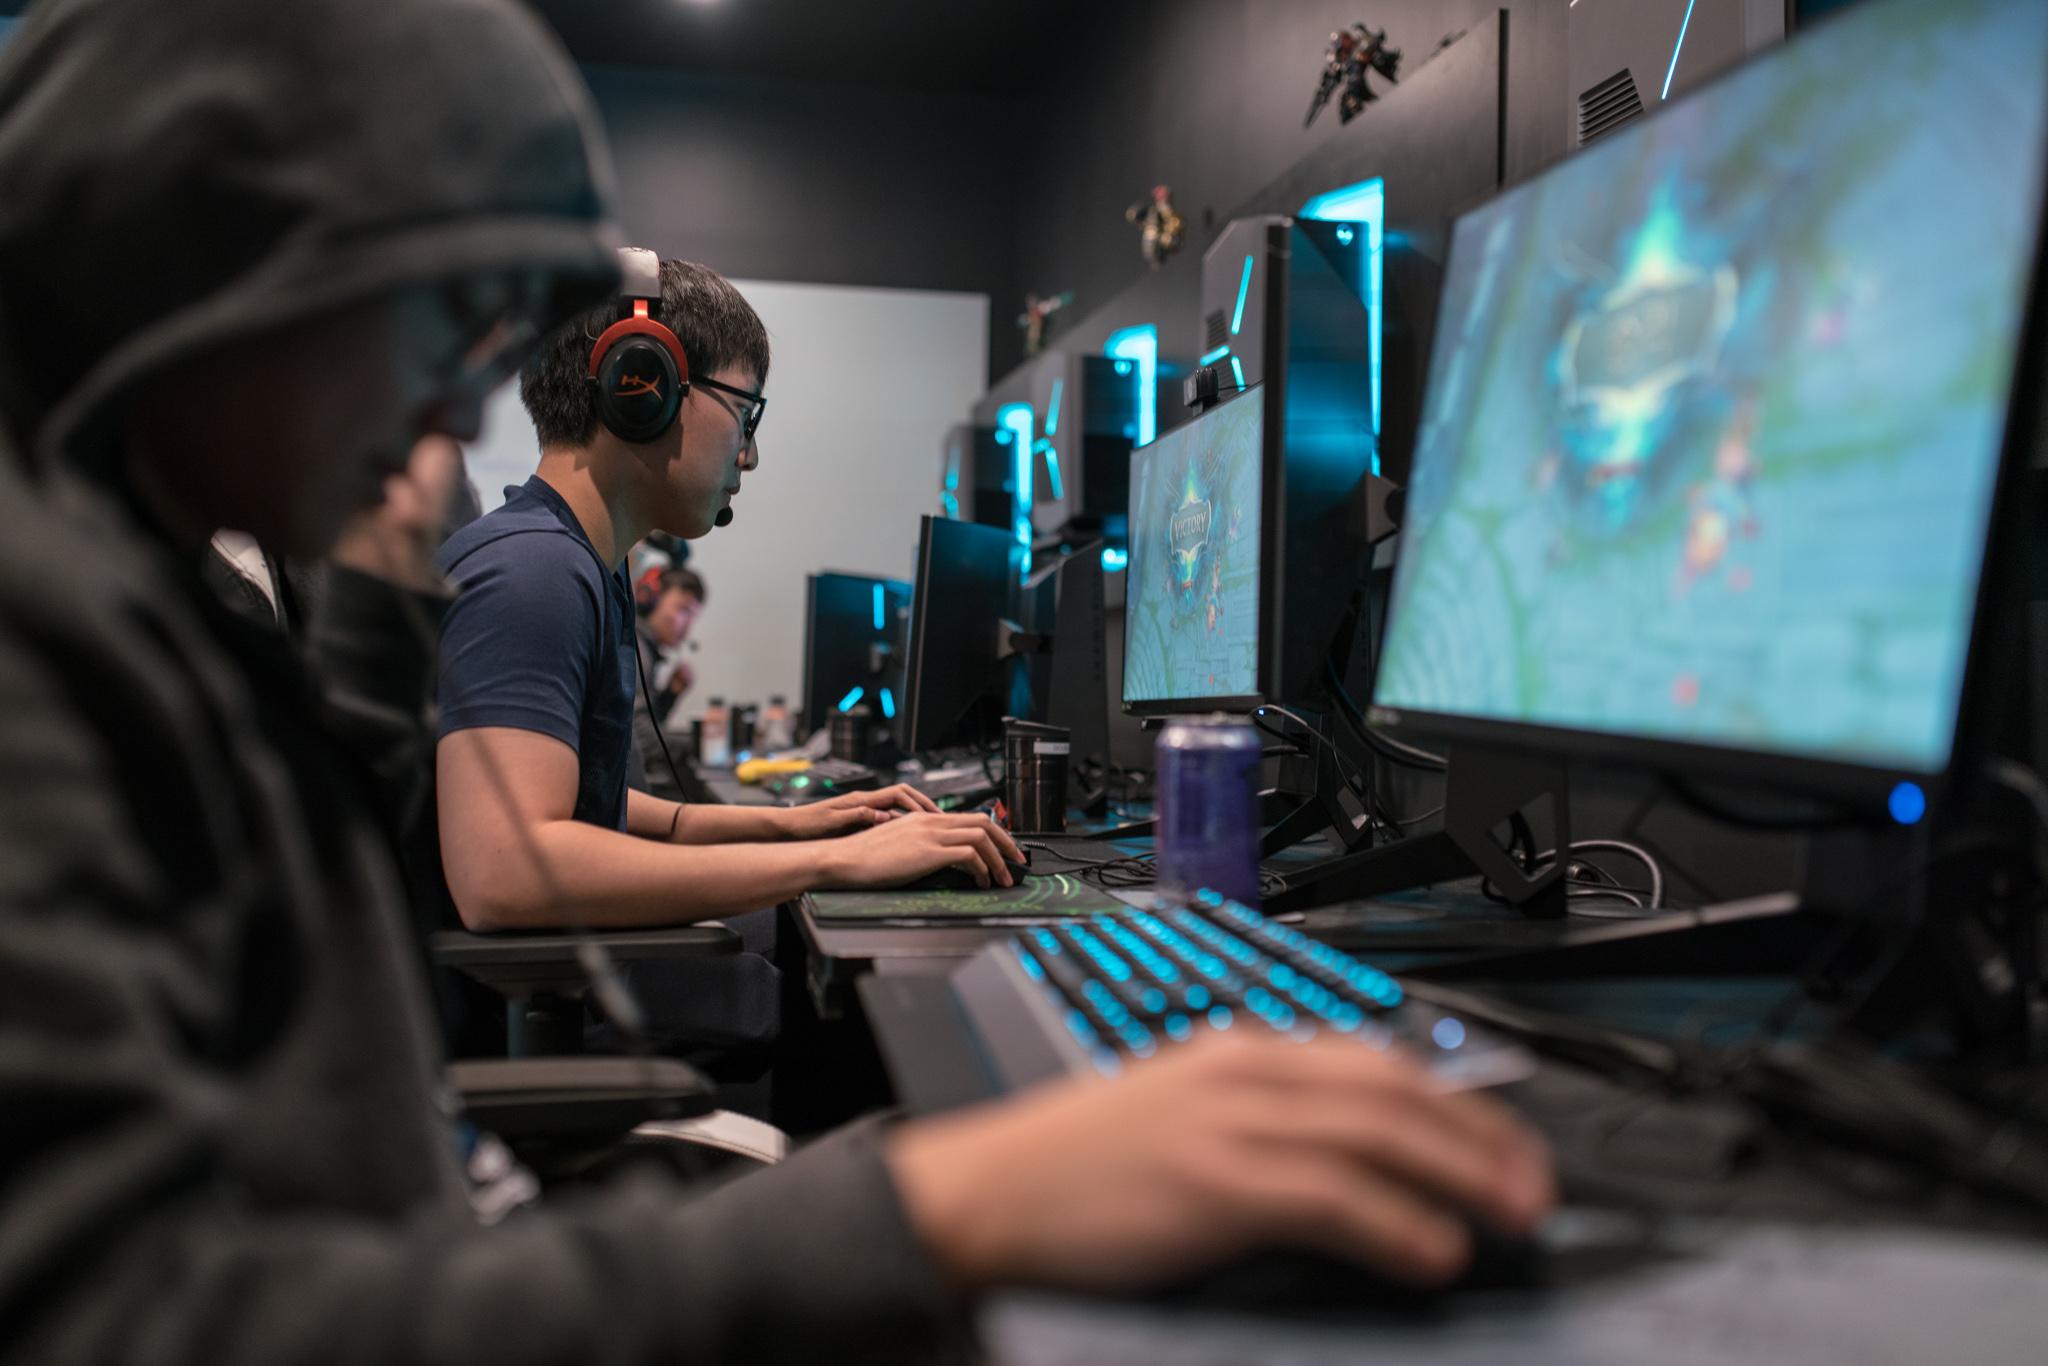 Рынок киберспорта в 2020 году достигнет $1,1 млрд, – Newzoo